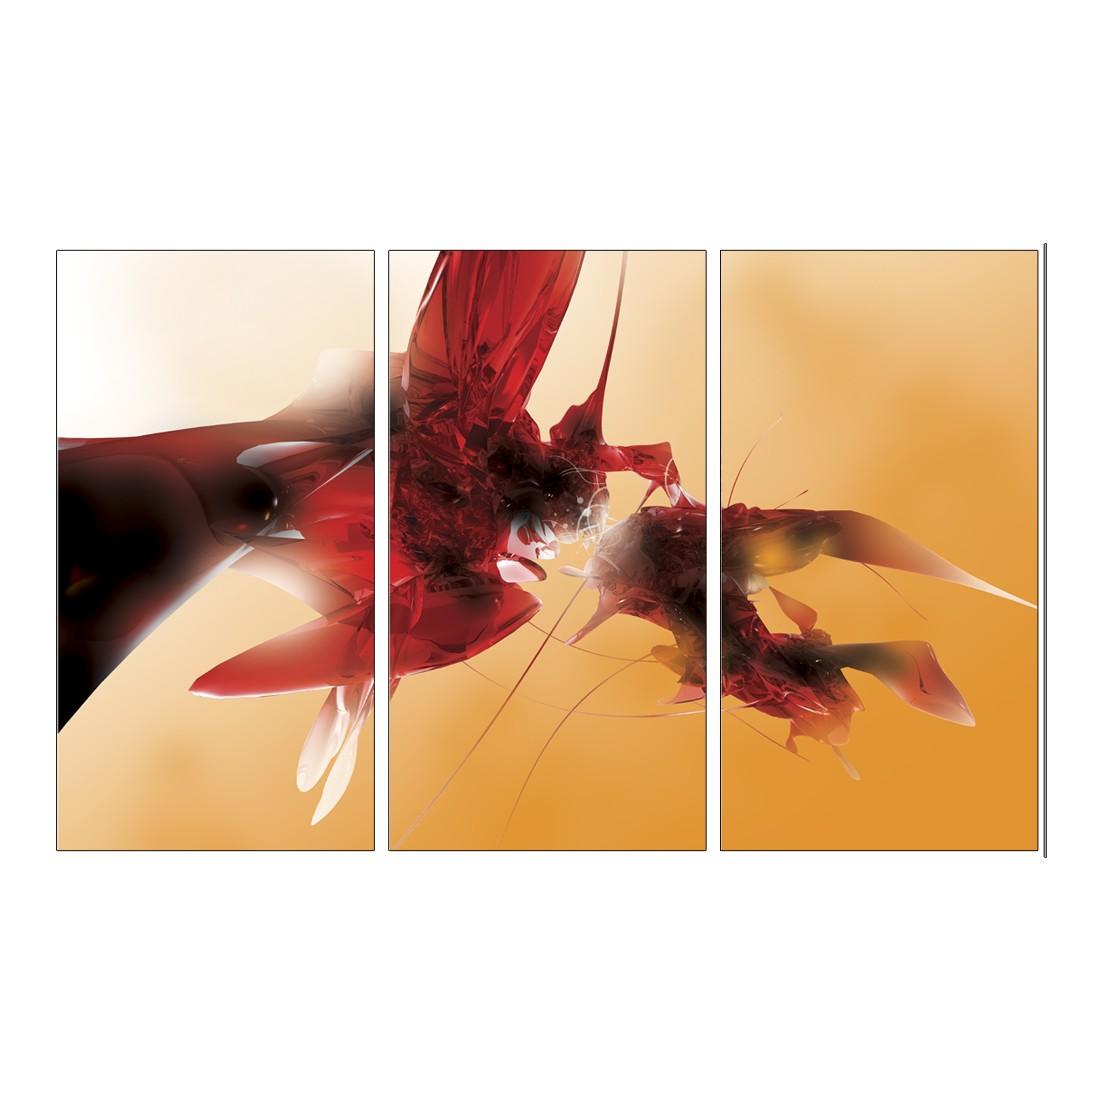 Leinwandbild Abstrakt Rot – 120 x 80cm, Gallery of Innovative Art jetzt bestellen